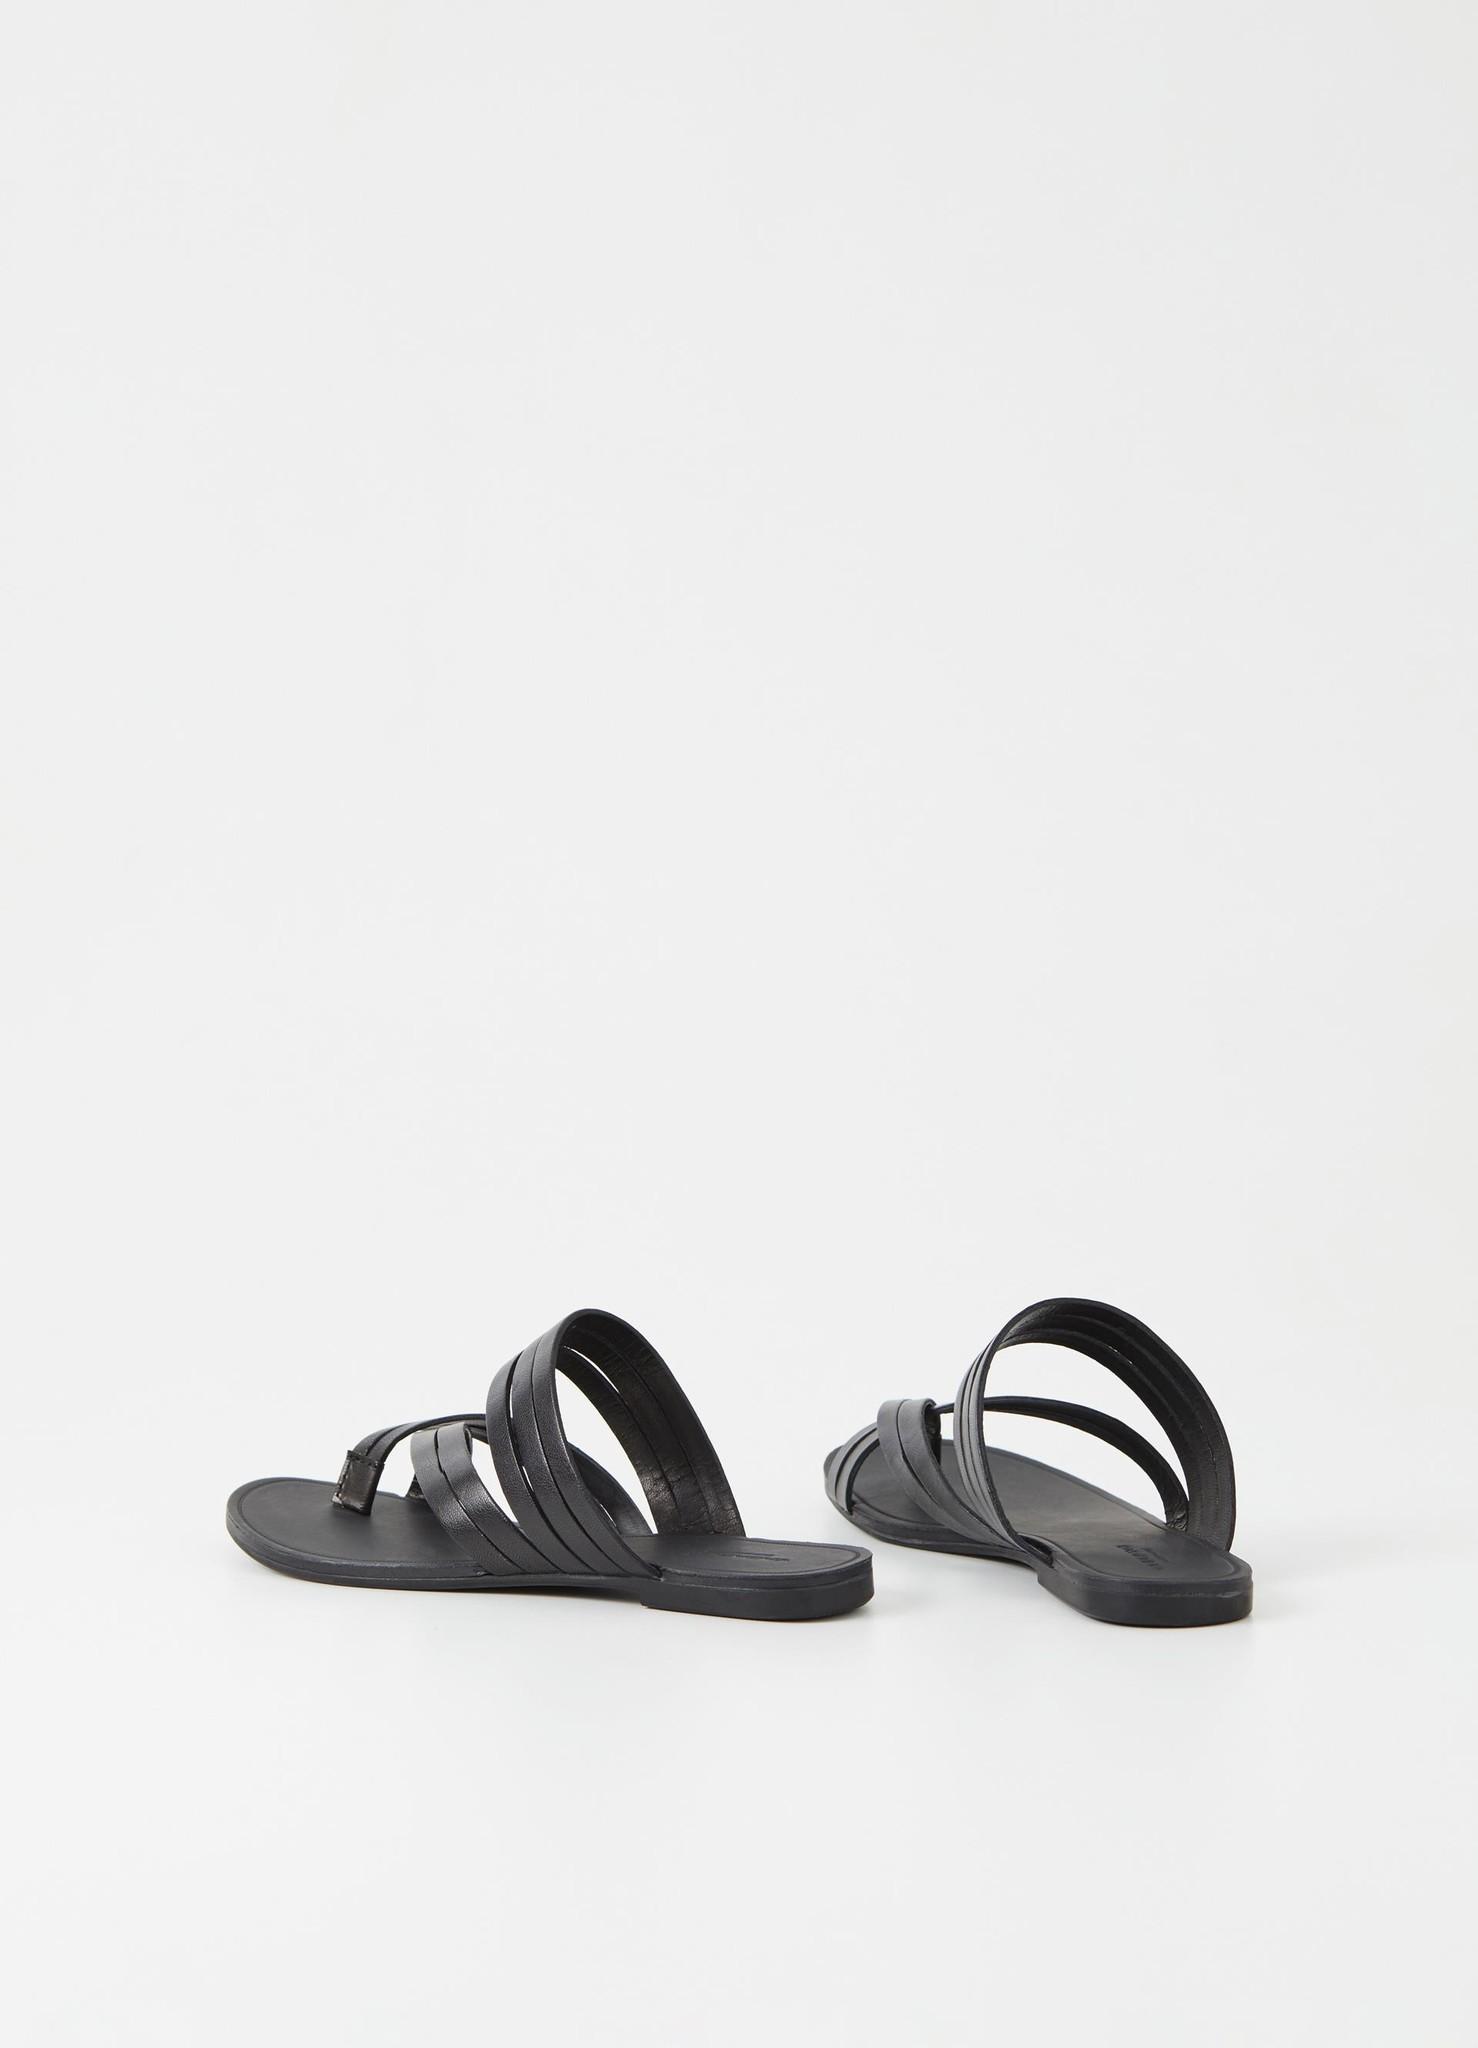 Tia Low Black Leather Sandals-2